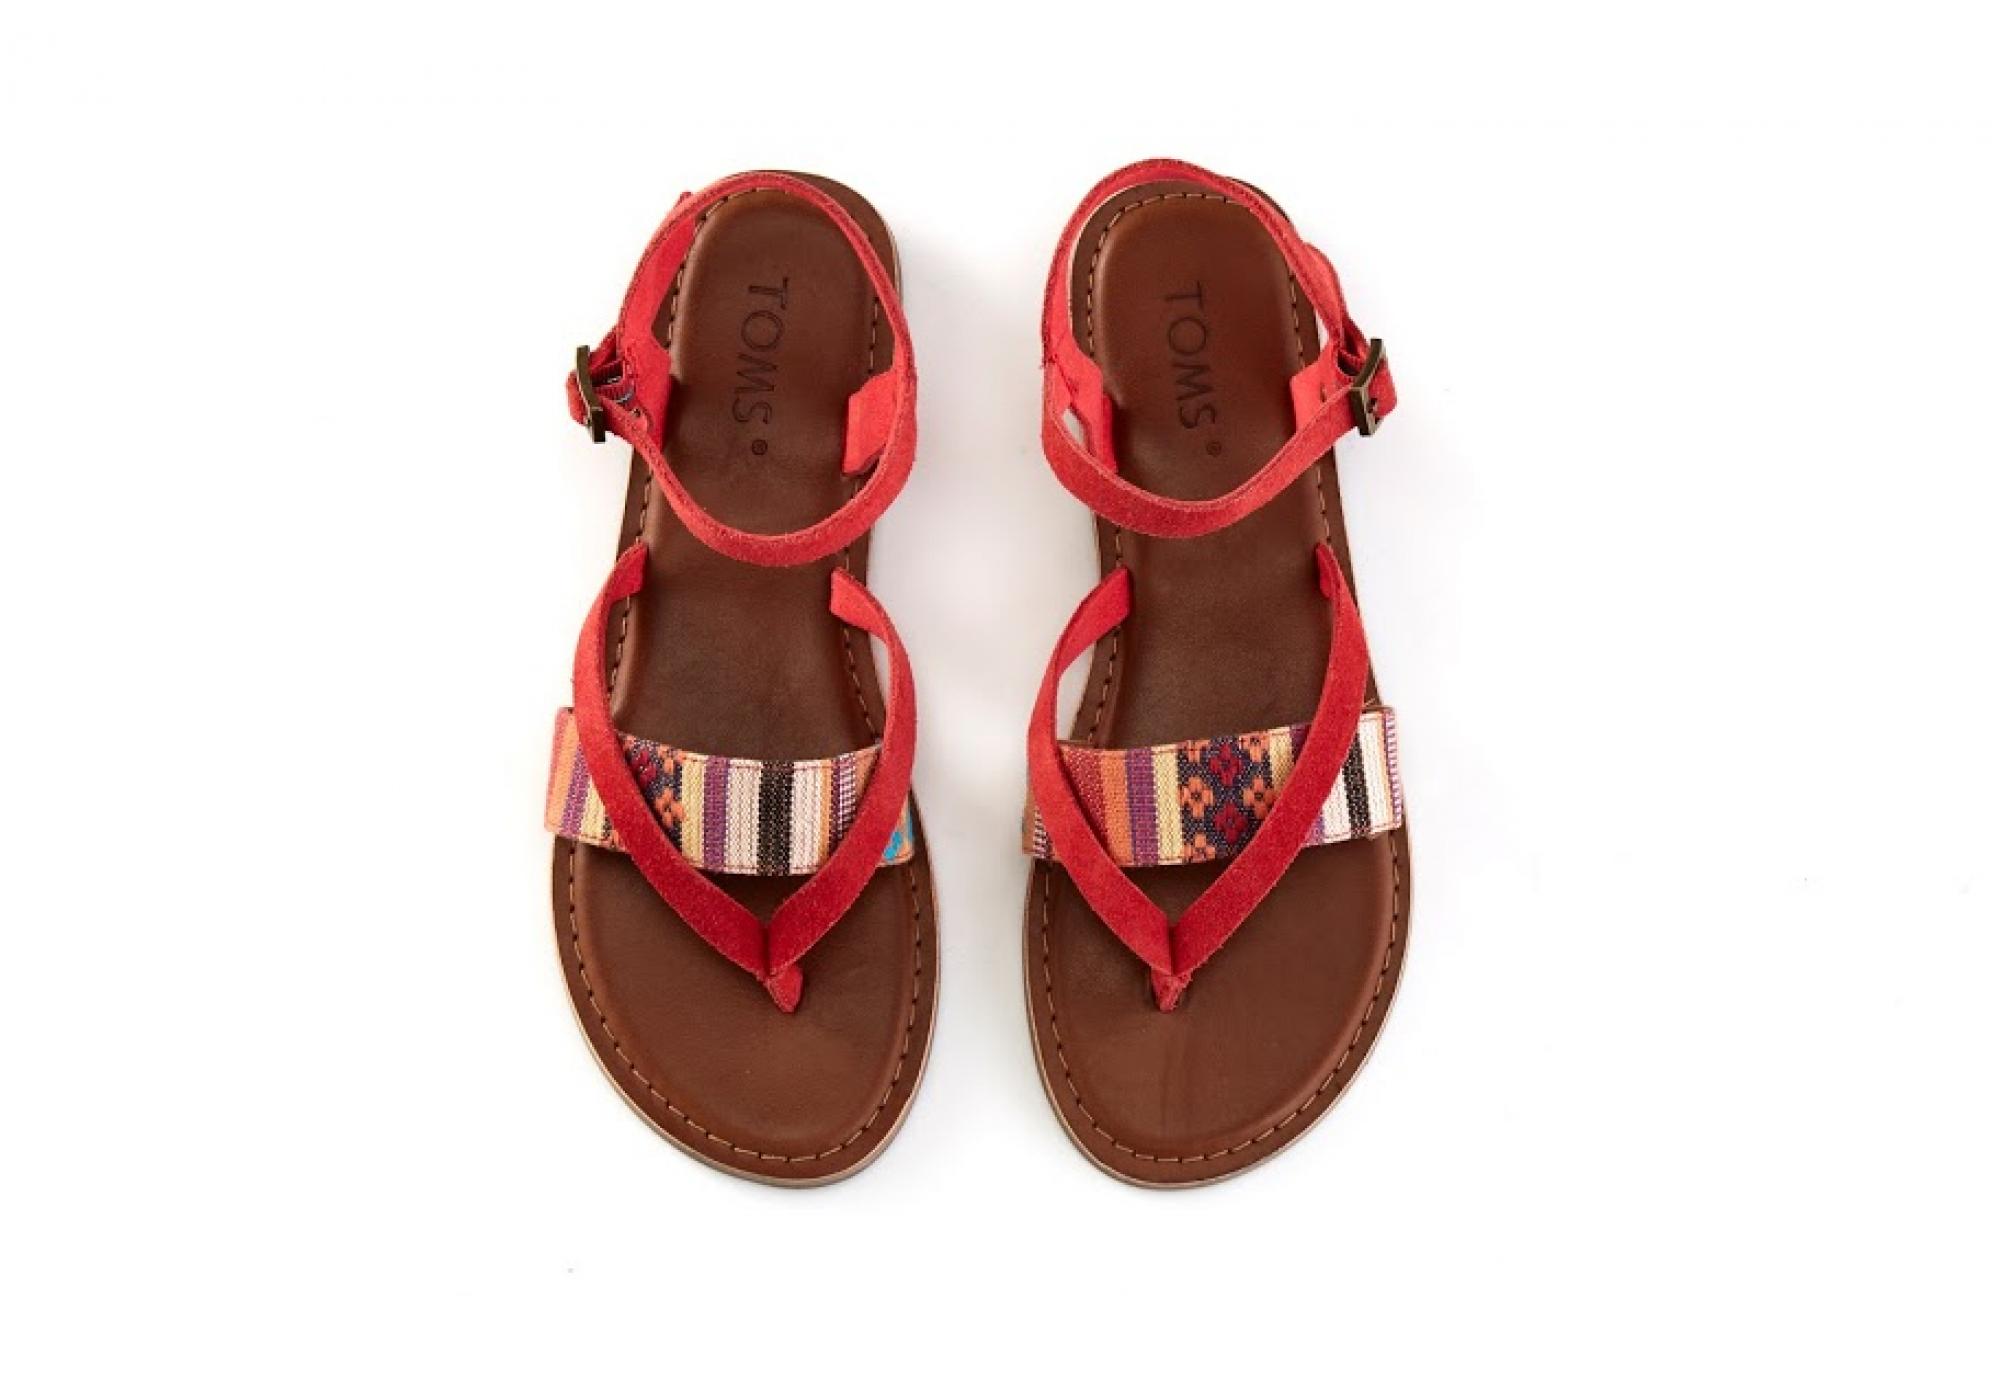 1270b36073 Barevné dámské sandálky TOMS Lexie Sandal